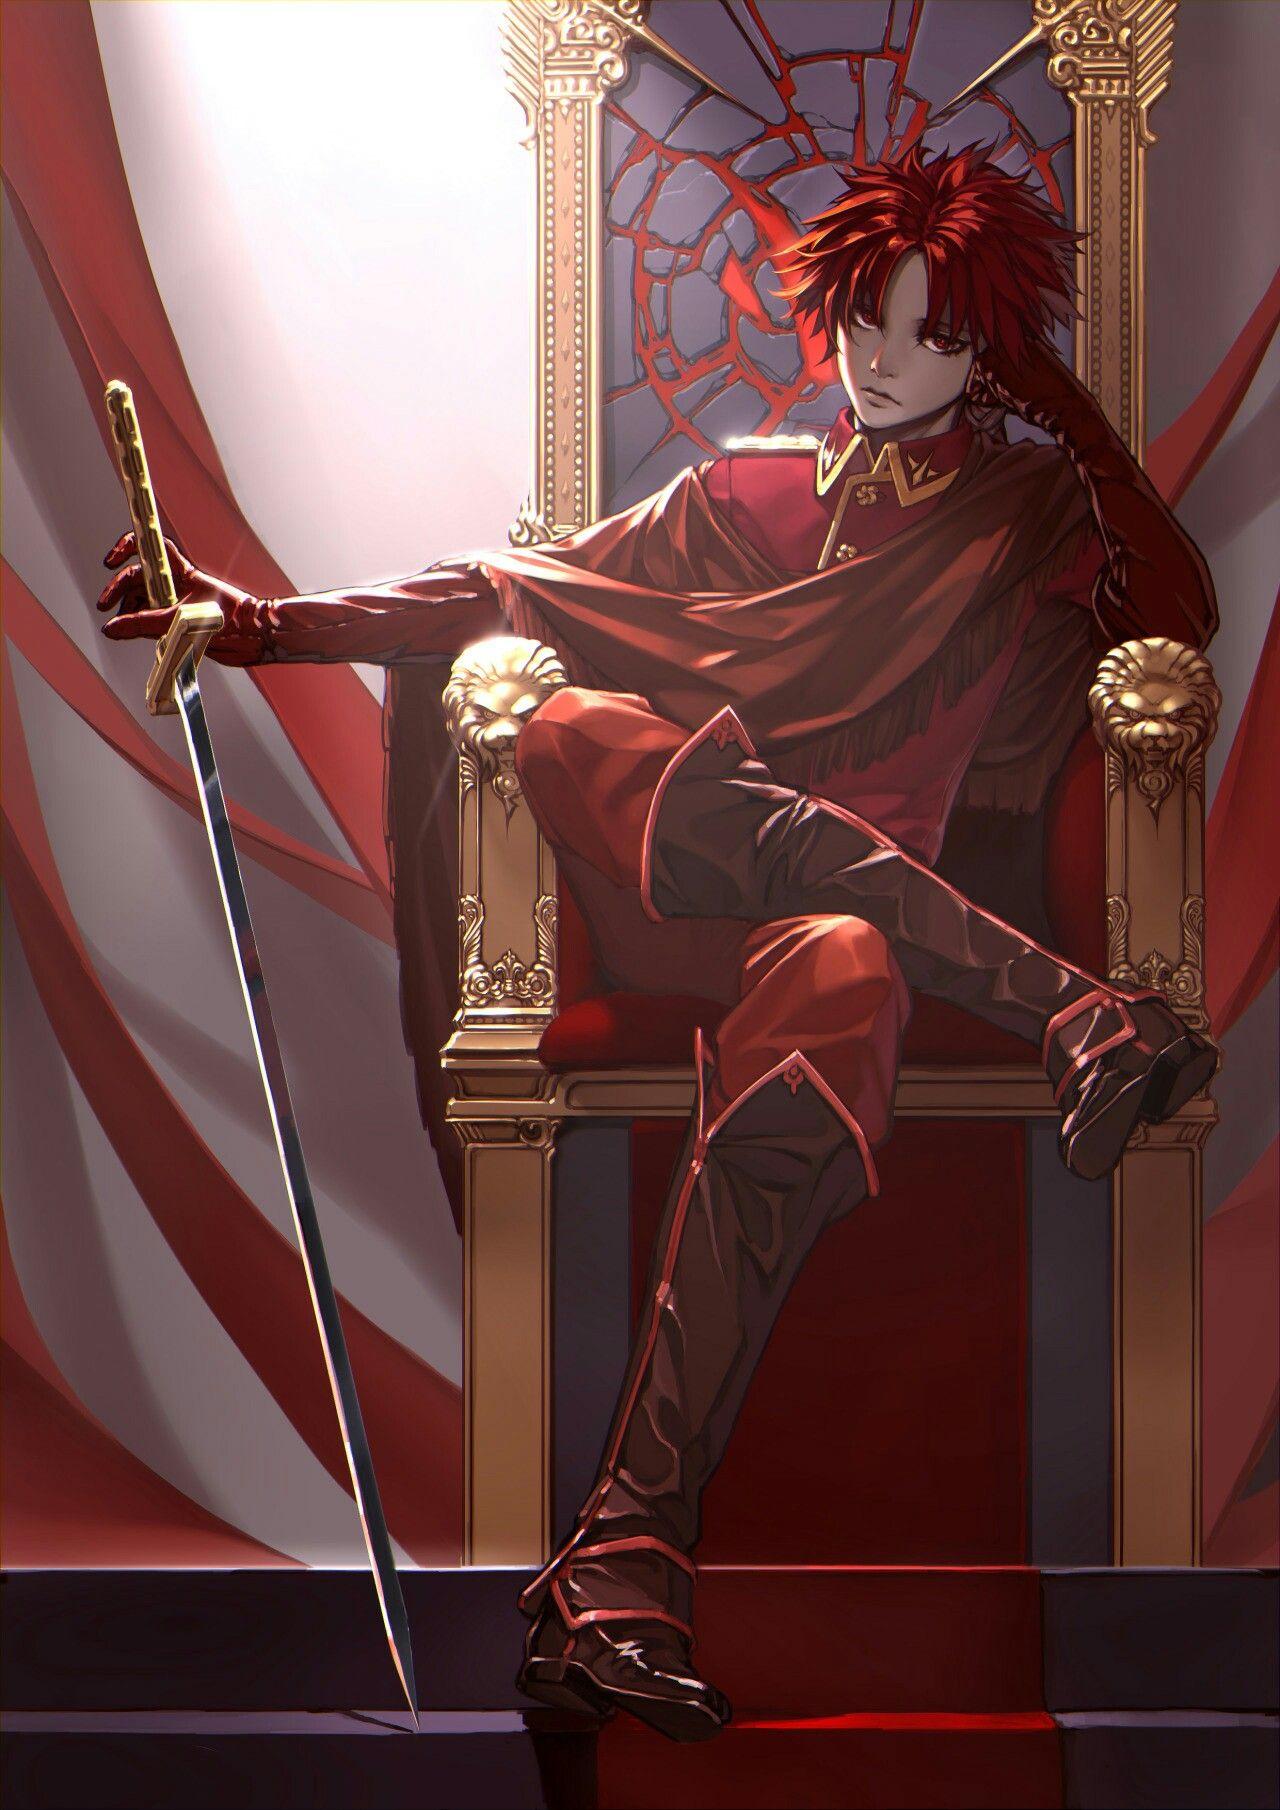 Anime boy king Anime art Pinterest Anime